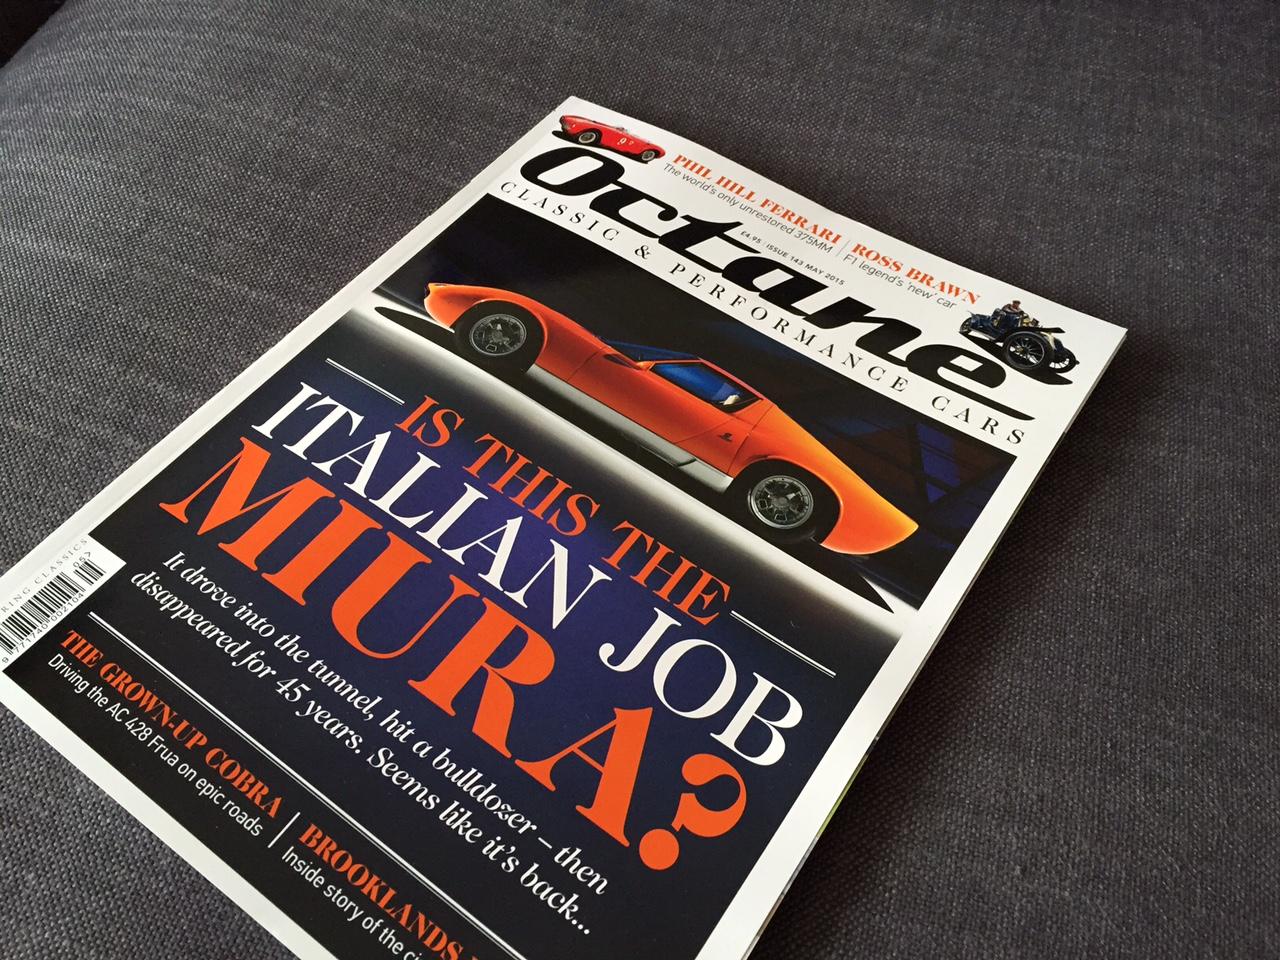 Lamborghini Miura Octane Magazine Cover